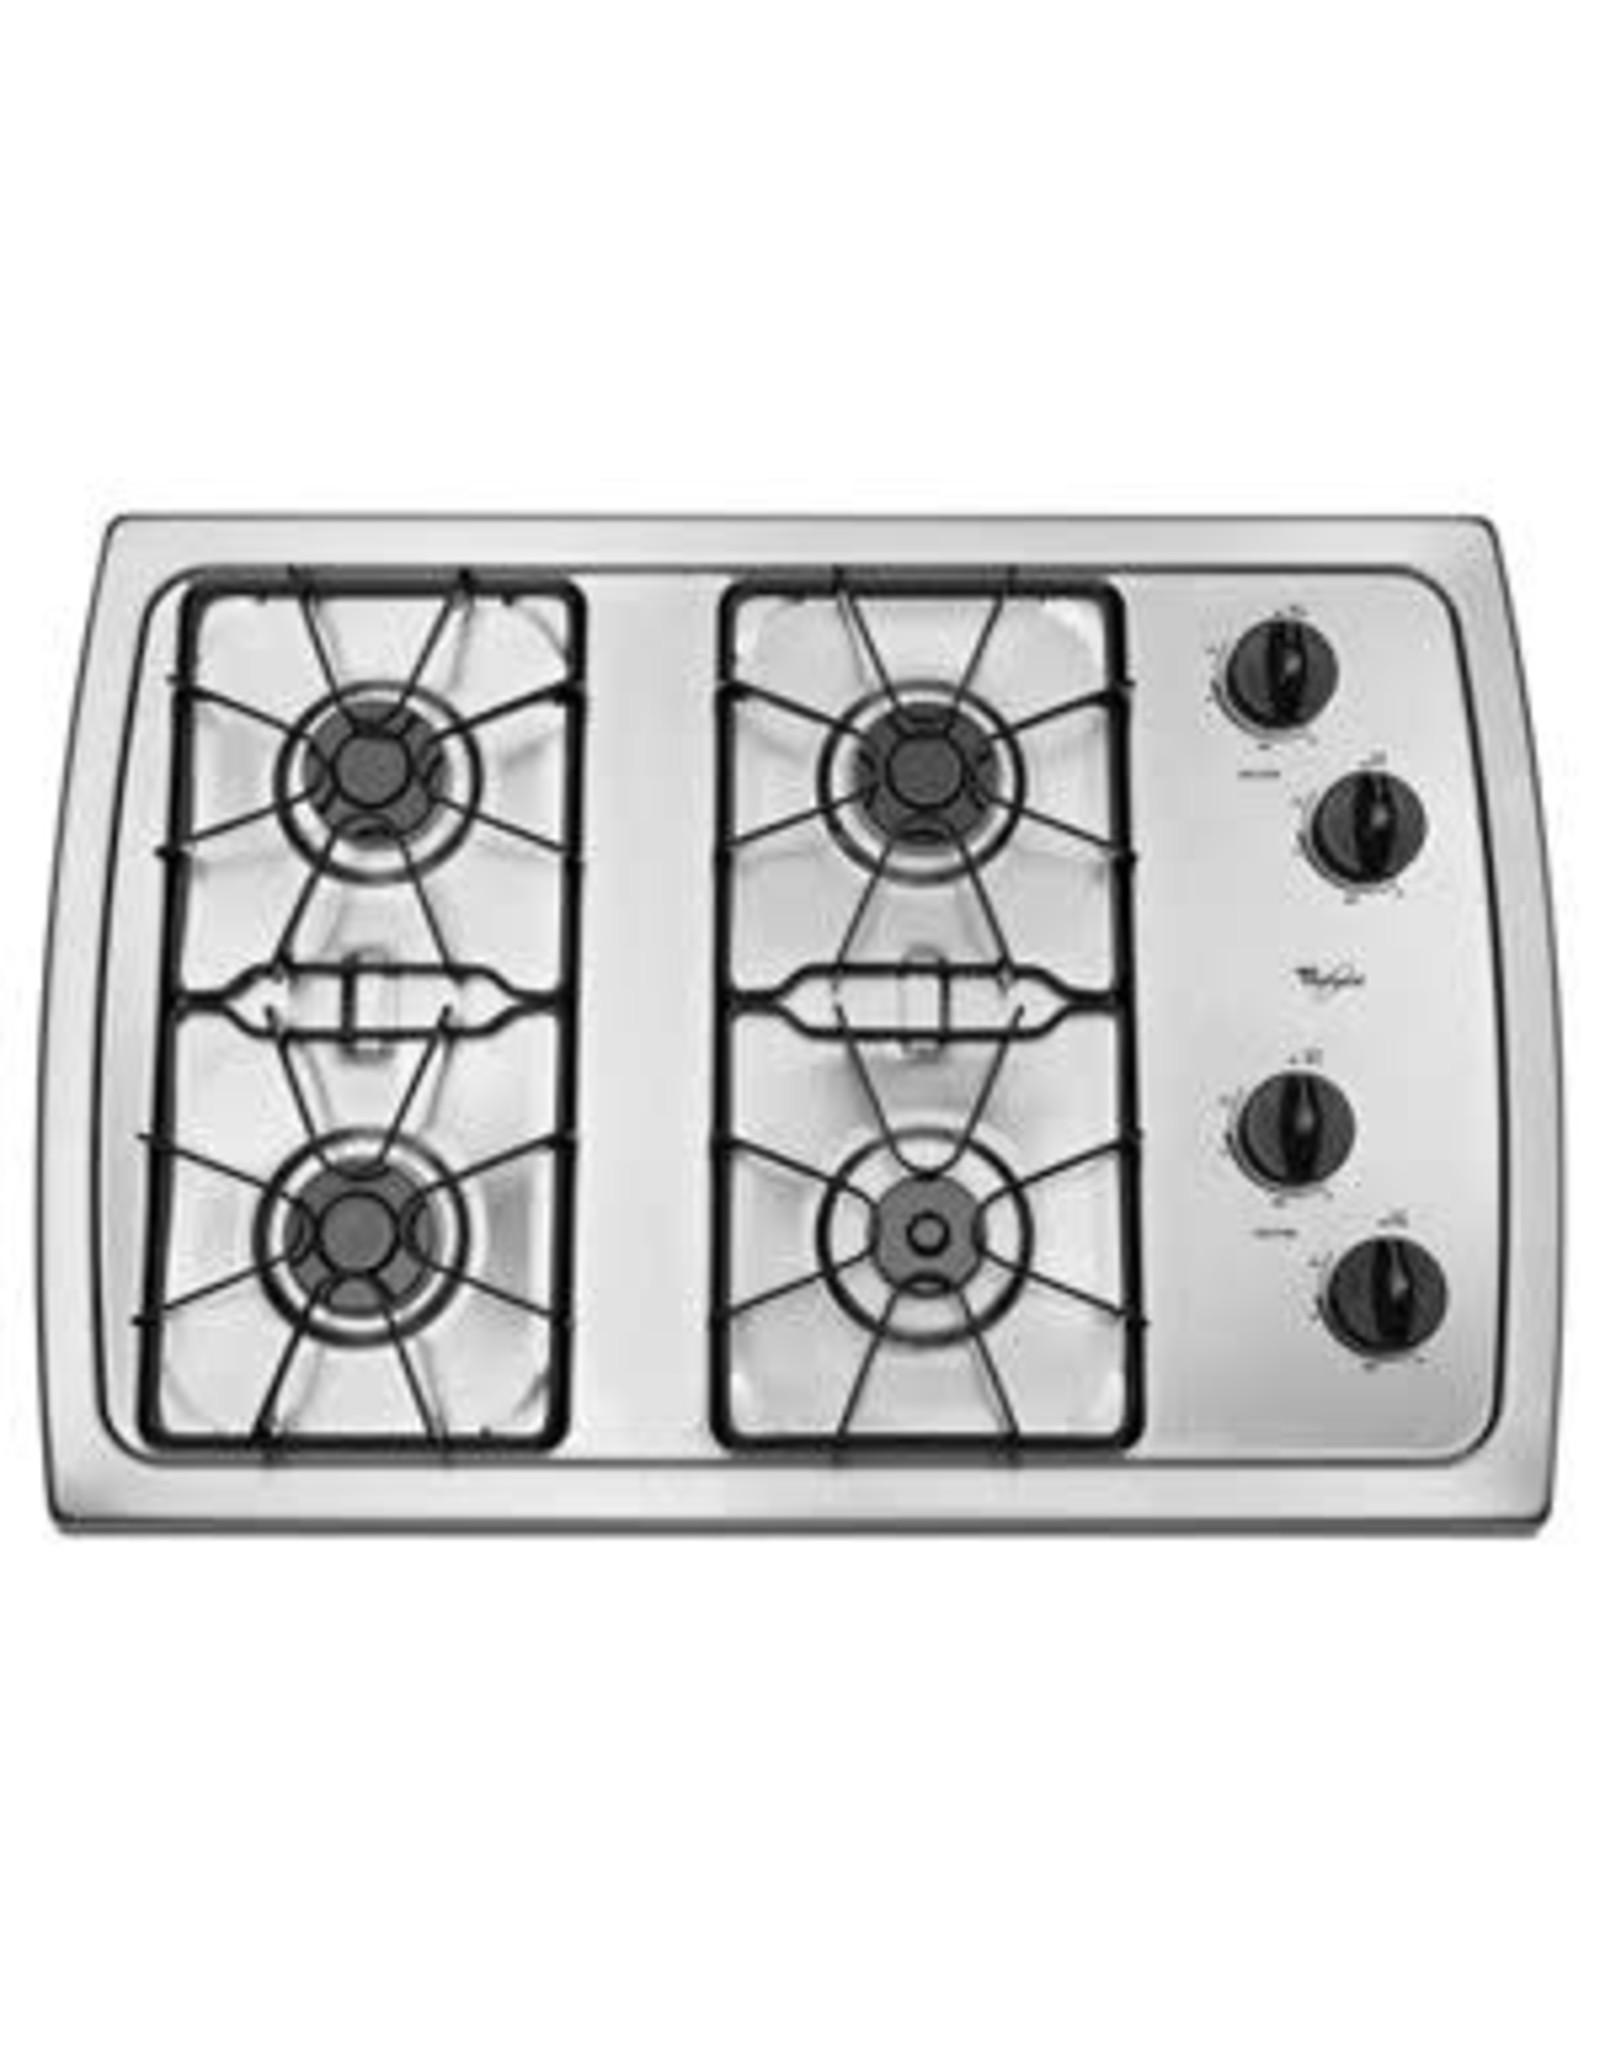 Whirlpool W3CG3014XS GAS Cooktop